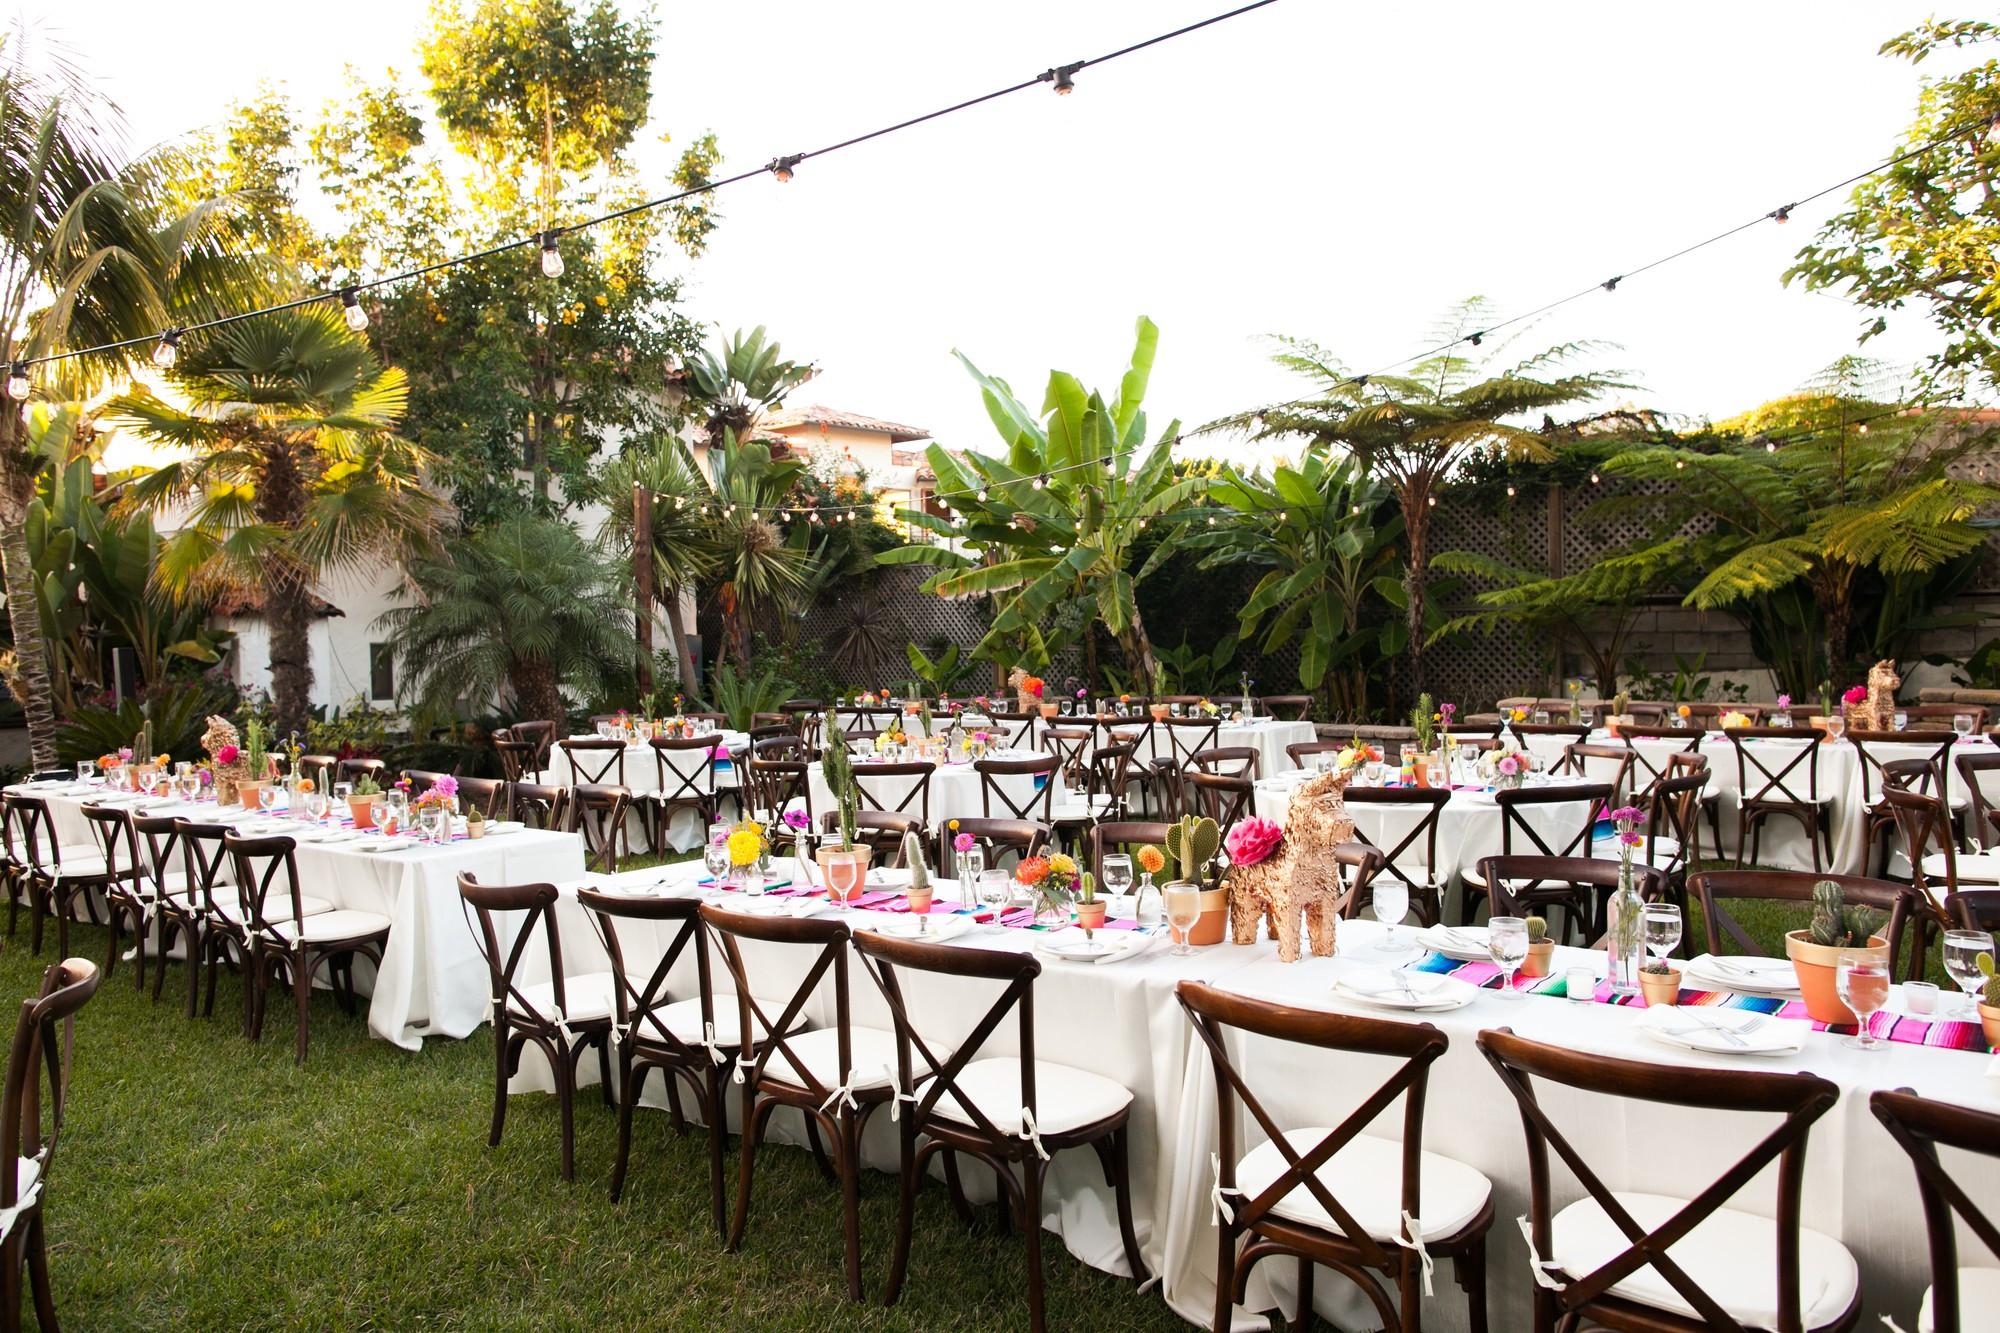 Catering Ideas For Backyard Party  Hacienda Loma Wedding San Diego